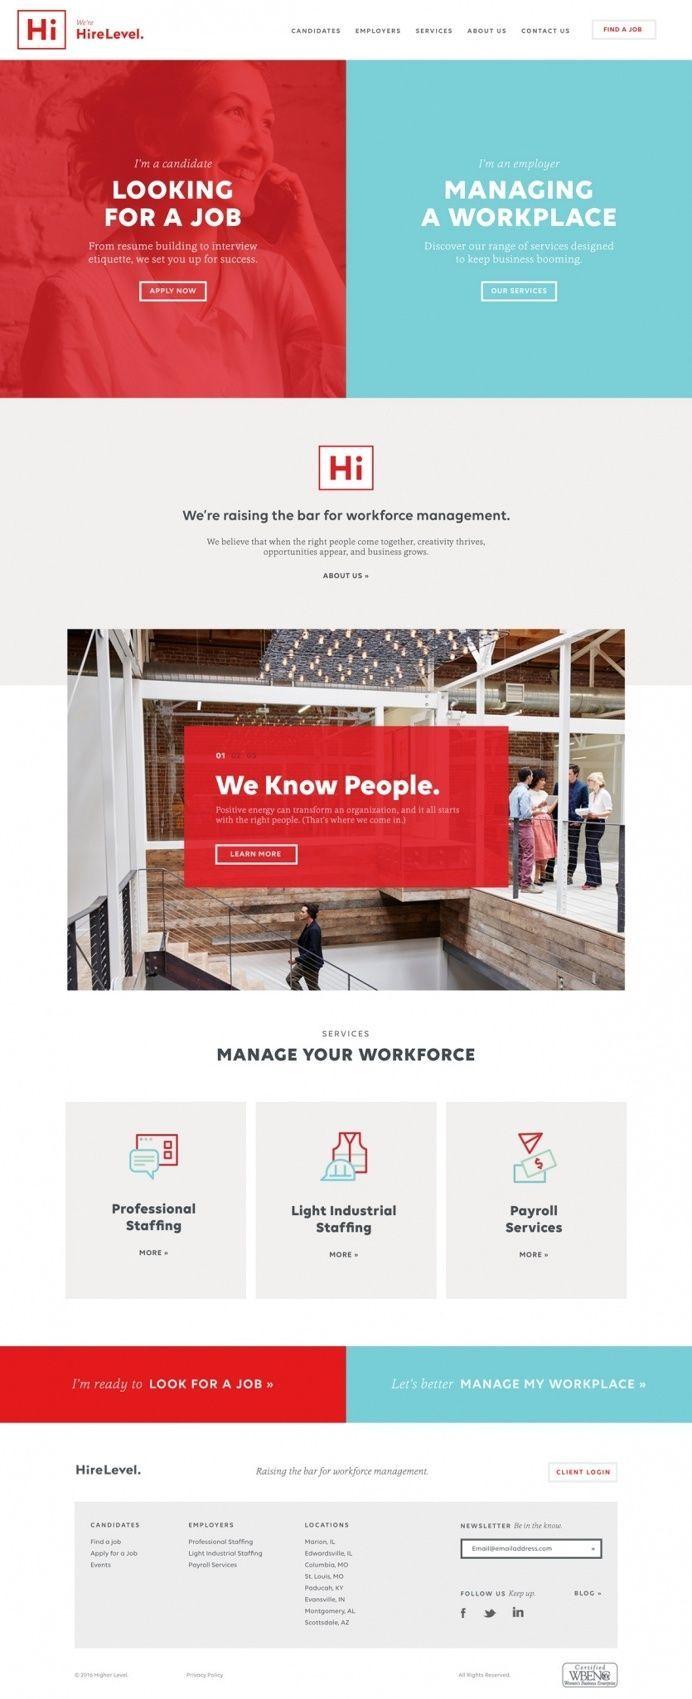 Hire Level Recruiting Job Website Webdesign Beautiful Minimal Business Award Site Of The Day Best Beauty Mindspar Web Design Web Design Services Website Design